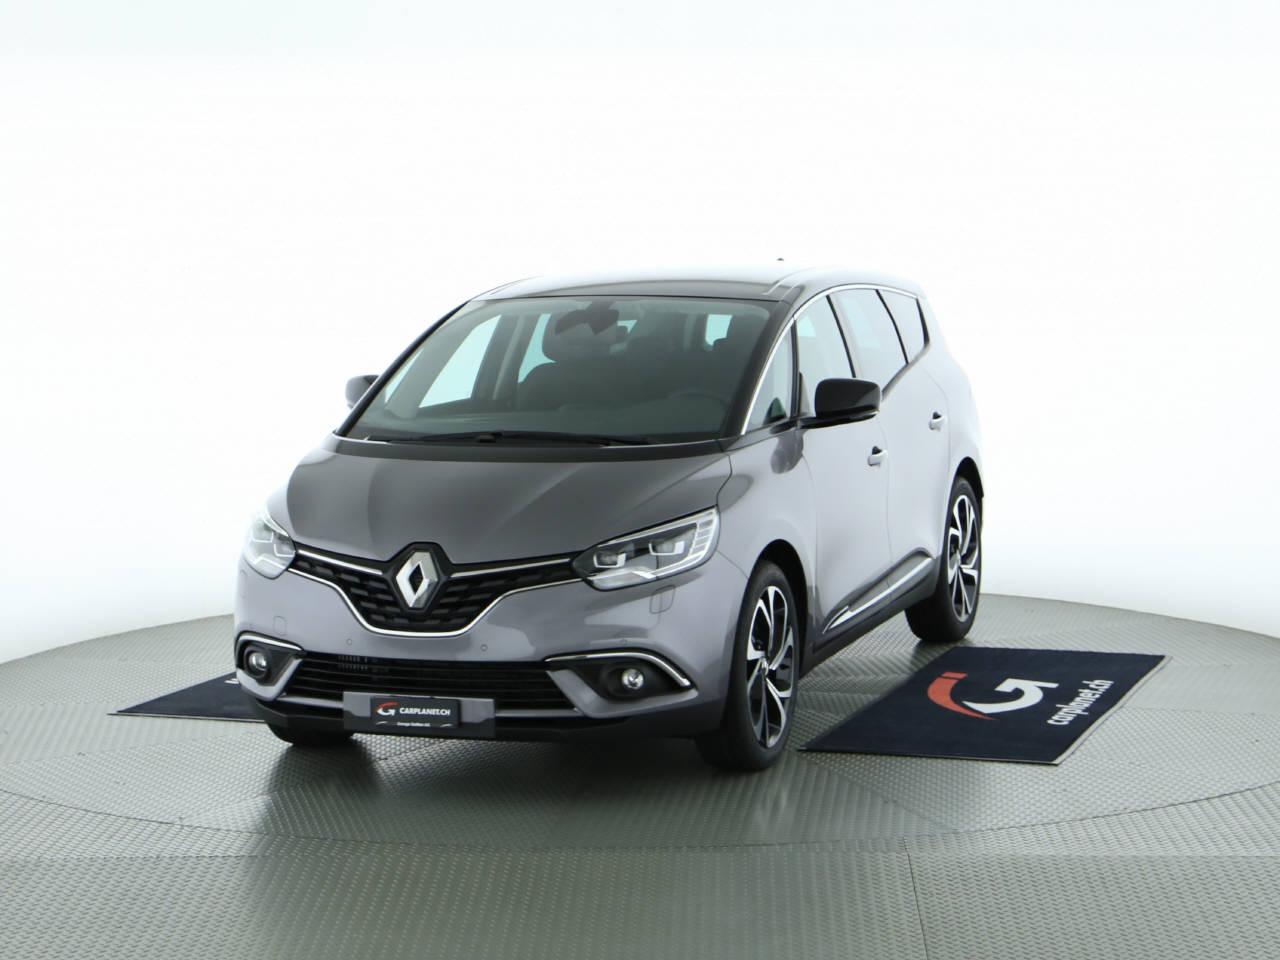 van Renault Scénic Grand Scénic 1.3 TCe 160 Inten